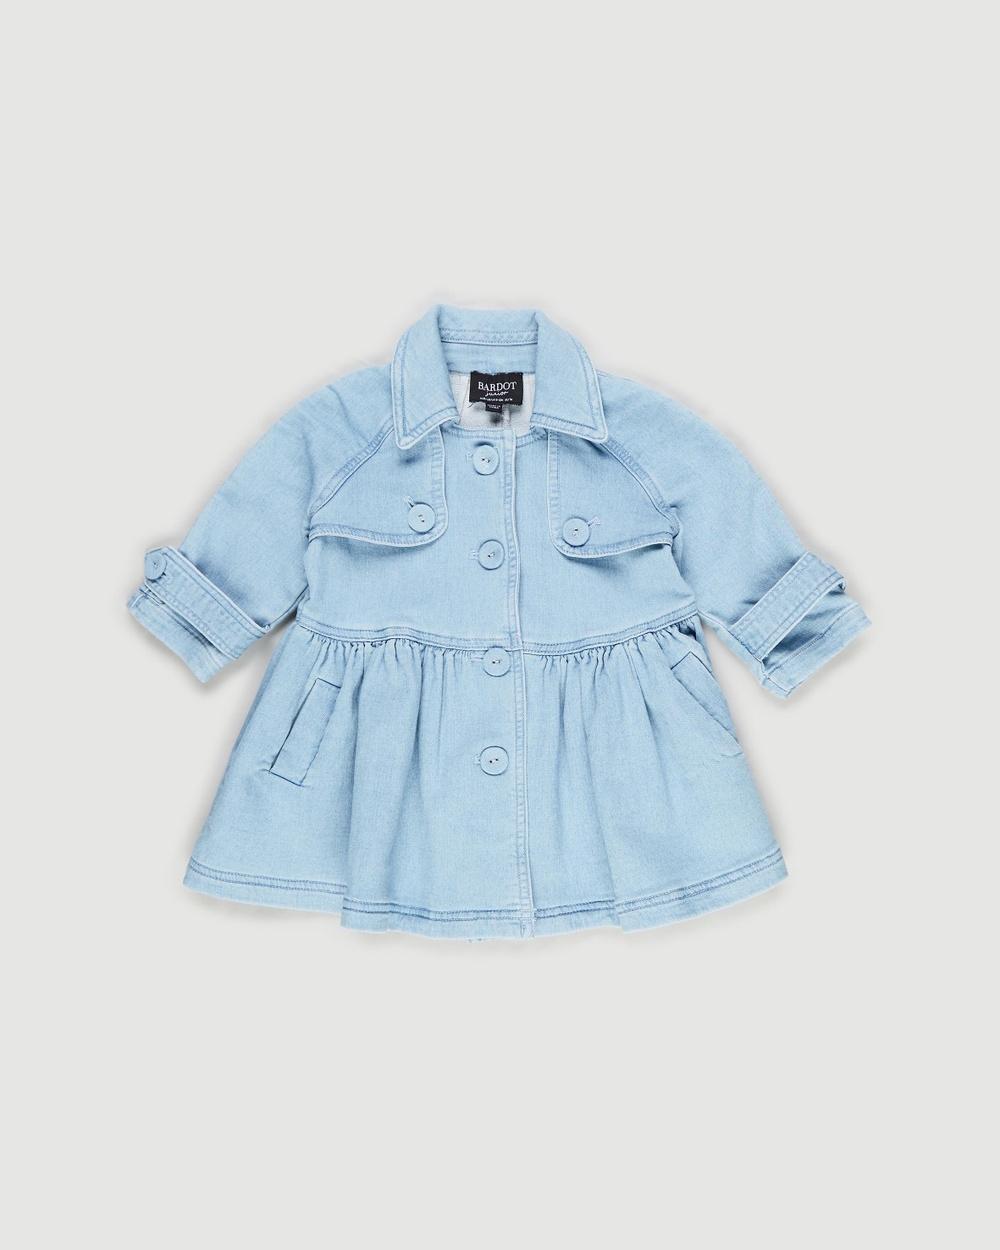 Bardot Junior Denim Mia Trench Babies jacket Vintage Blue Australia